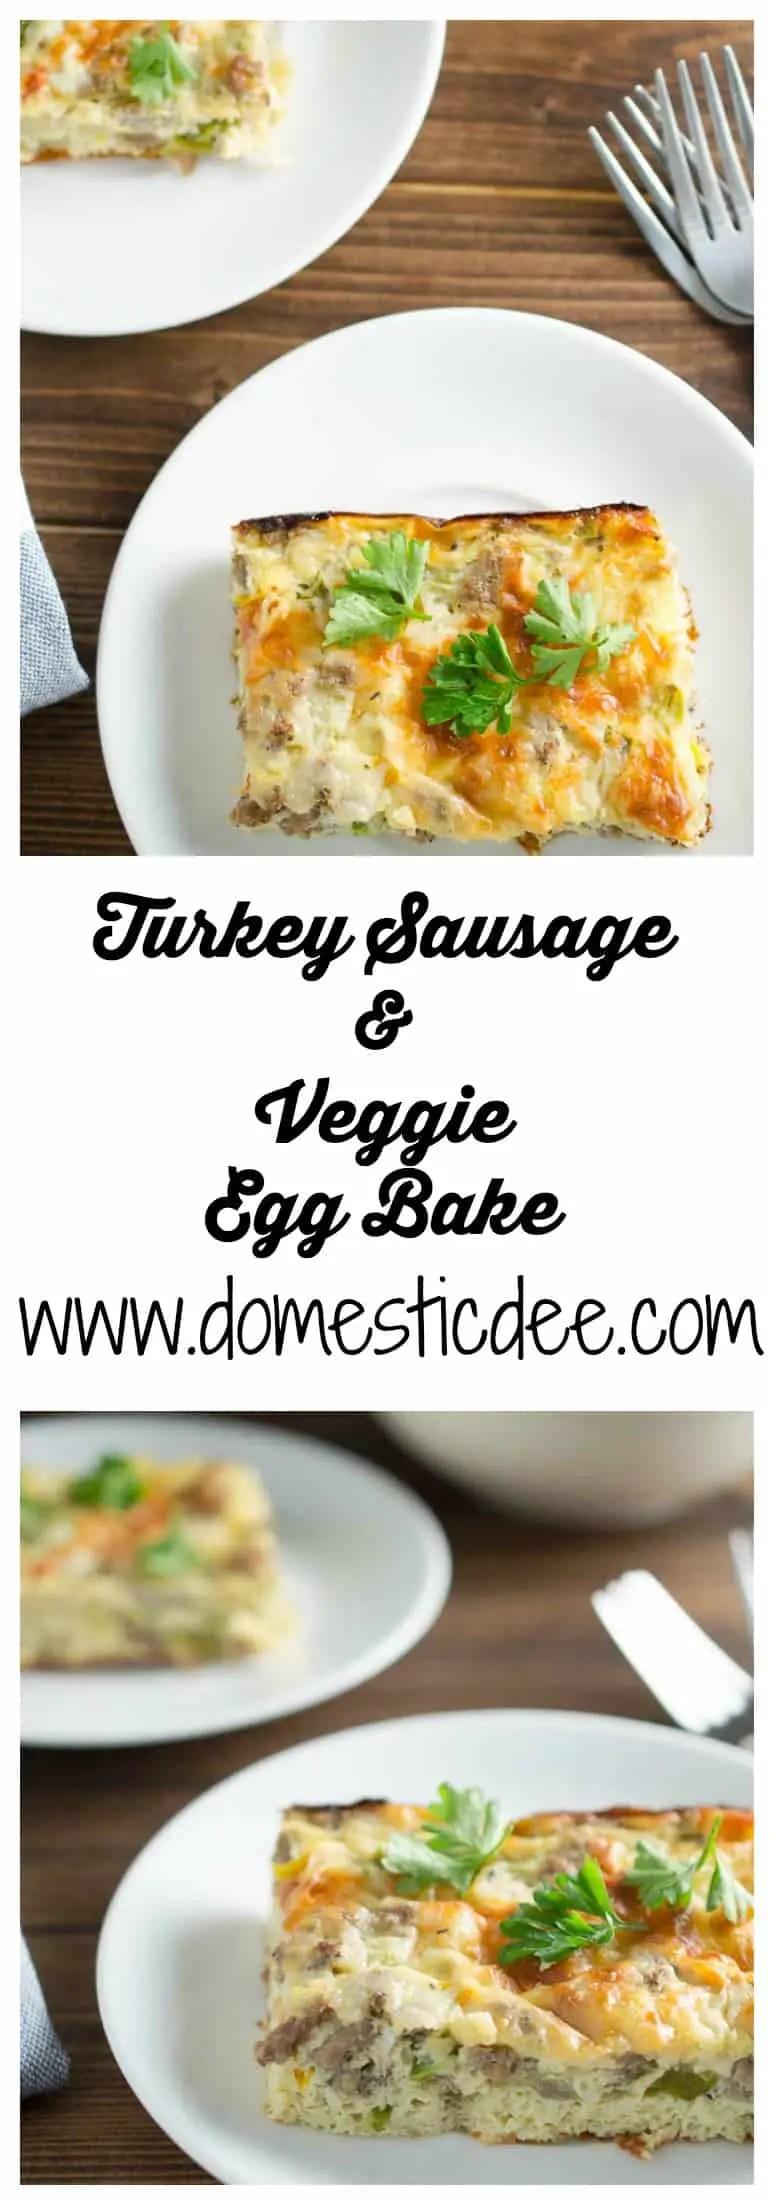 Turkey Sausage and Veggie Egg Bake